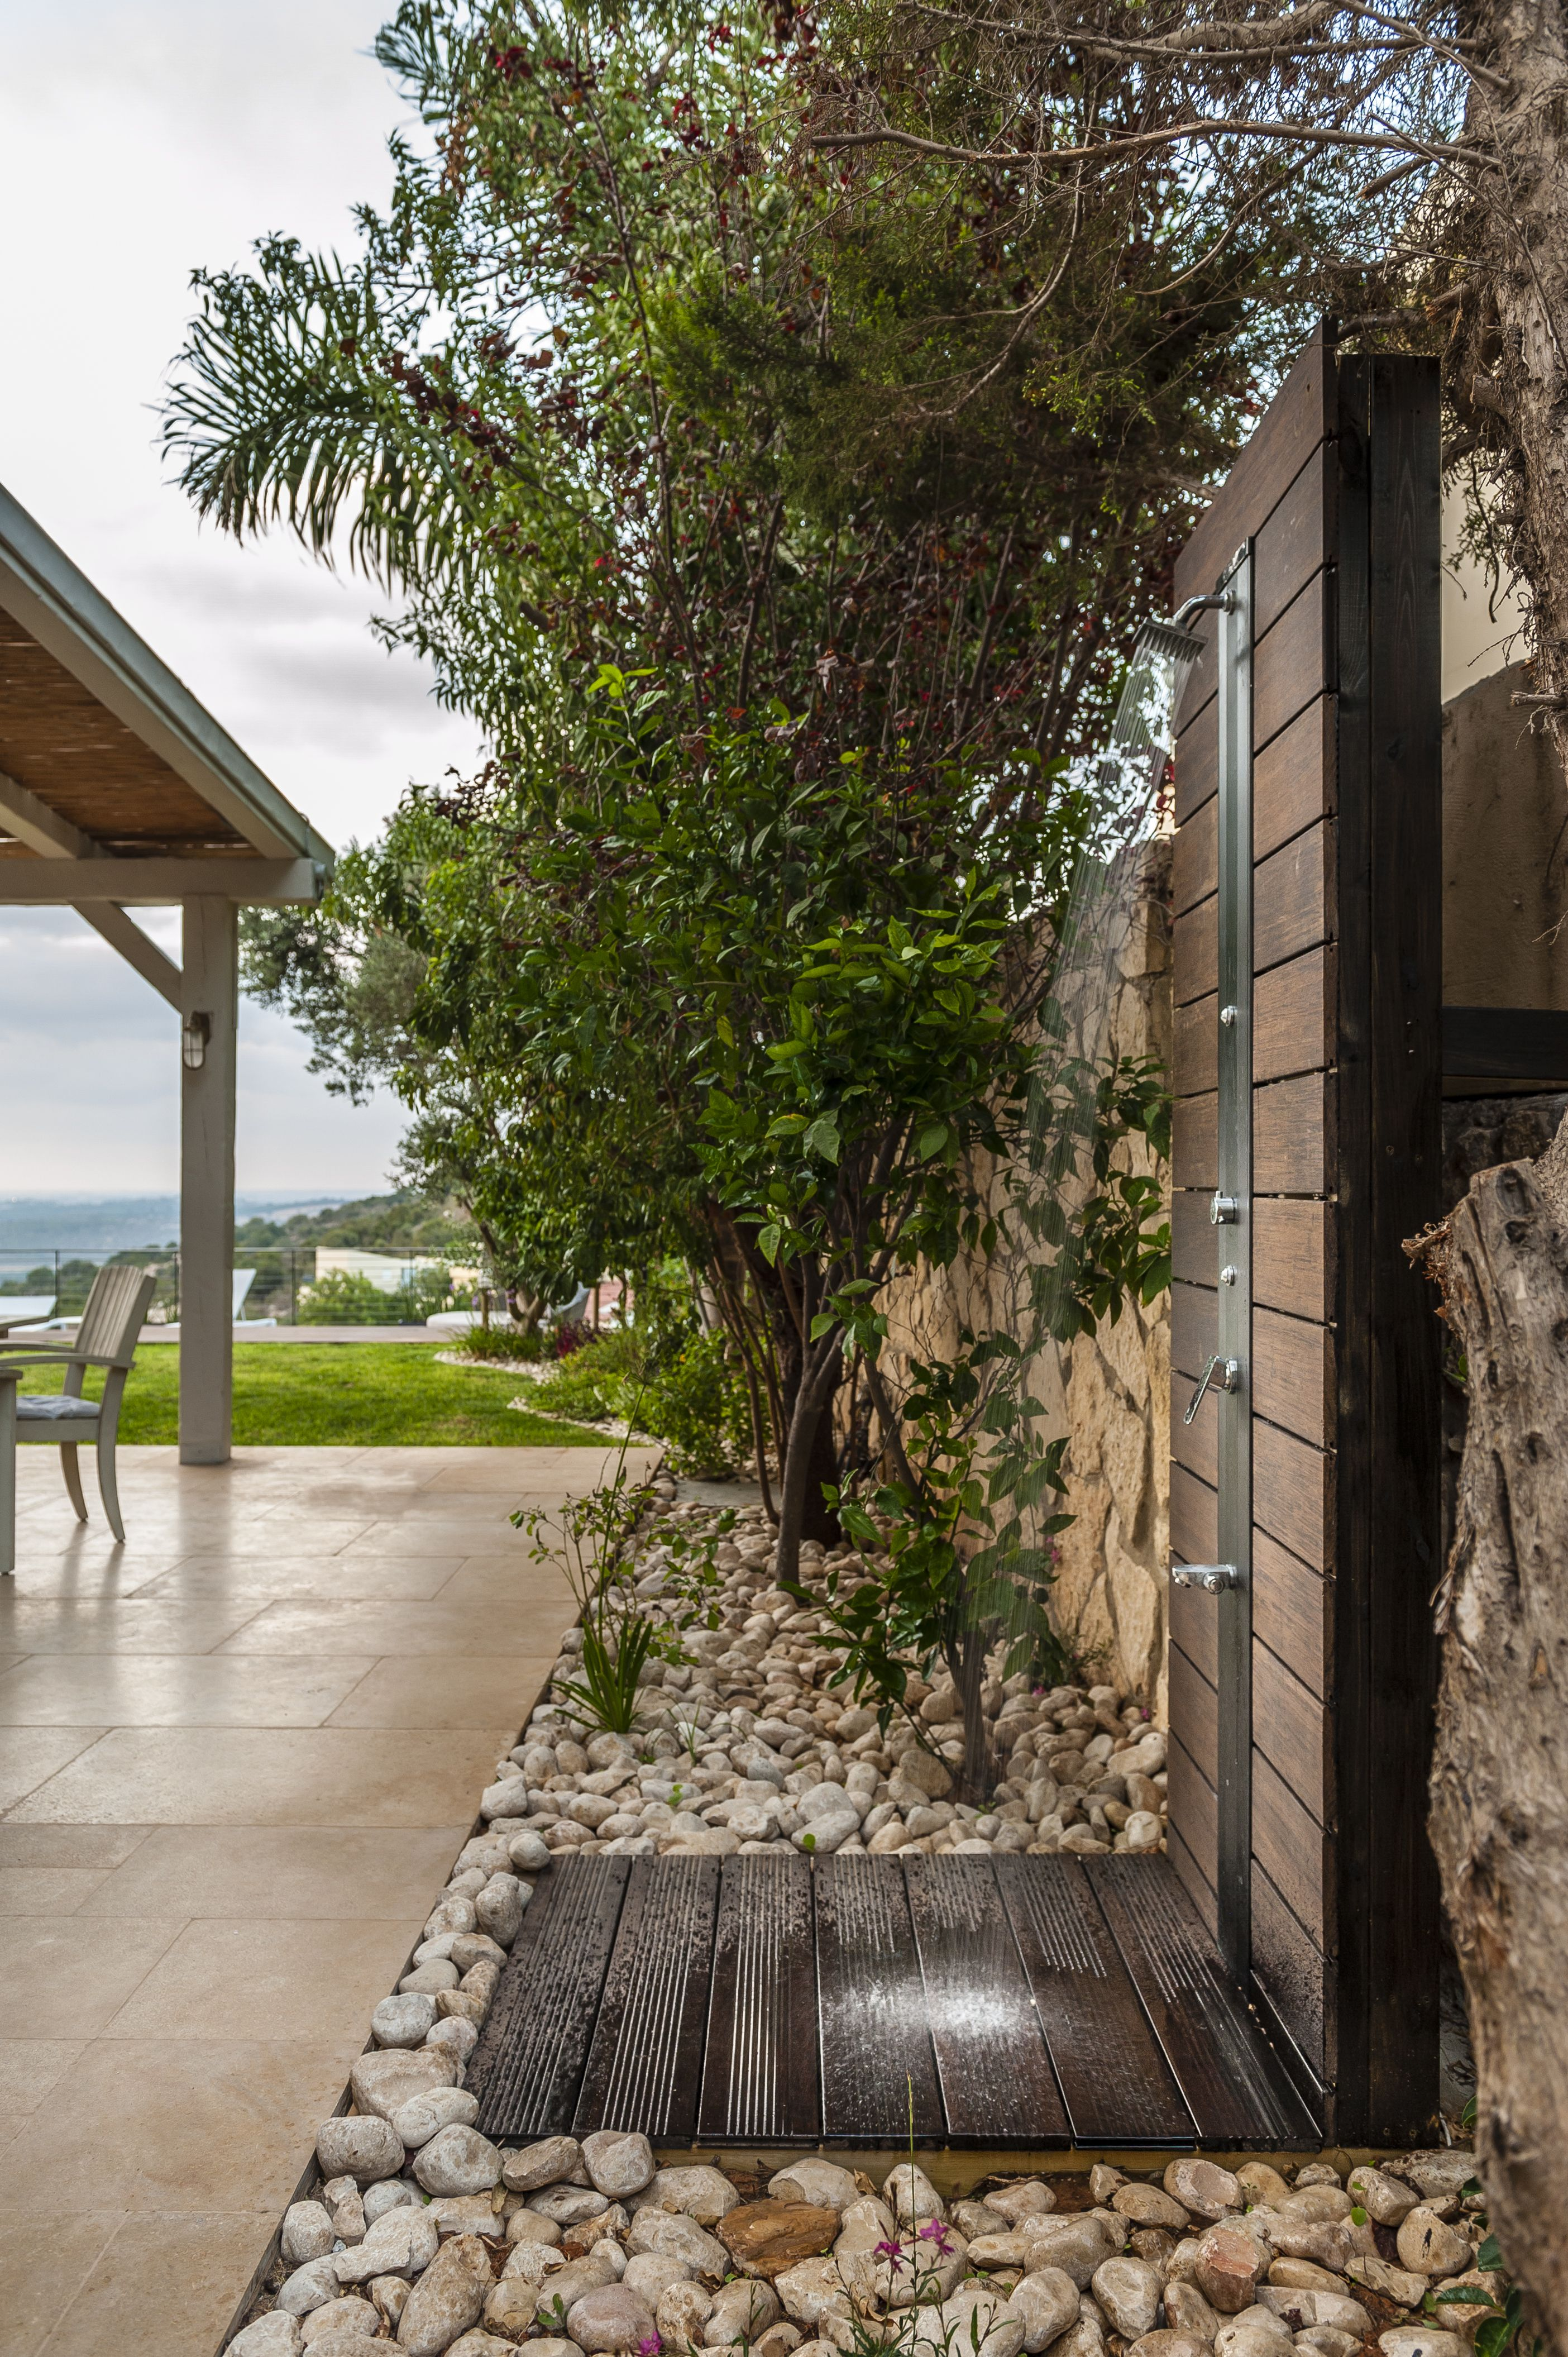 Outdoor shower hausinspirationen pinterest duchas piscinas y ducha exterior - Duchas para piscinas exterior ...